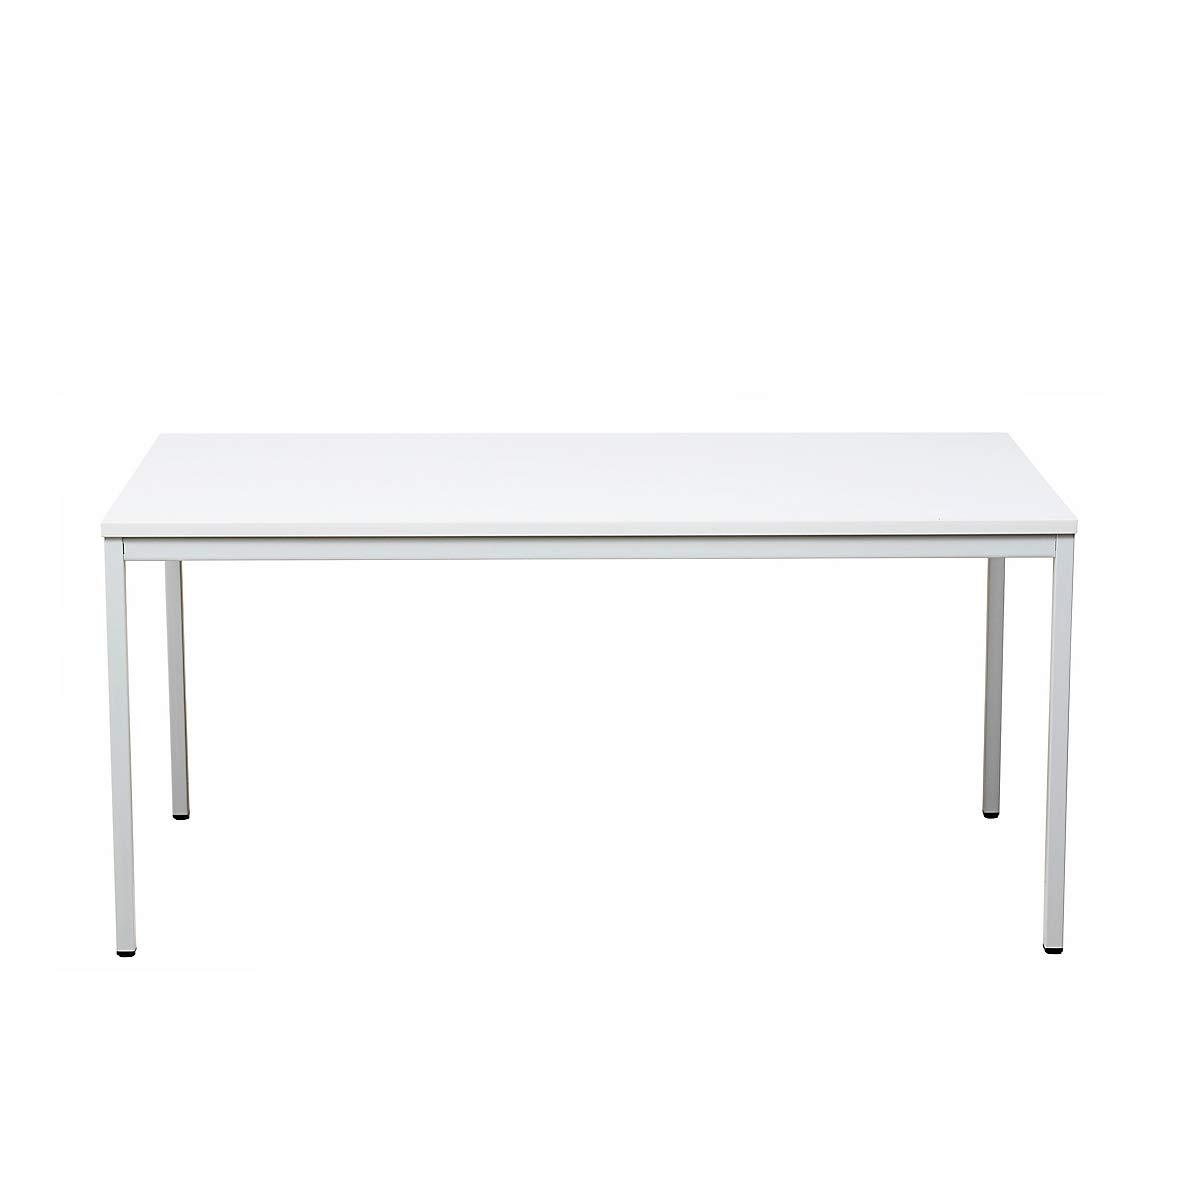 Certeo - Mesa rectangular (75 x 200 x 80 cm), color blanco: Amazon ...